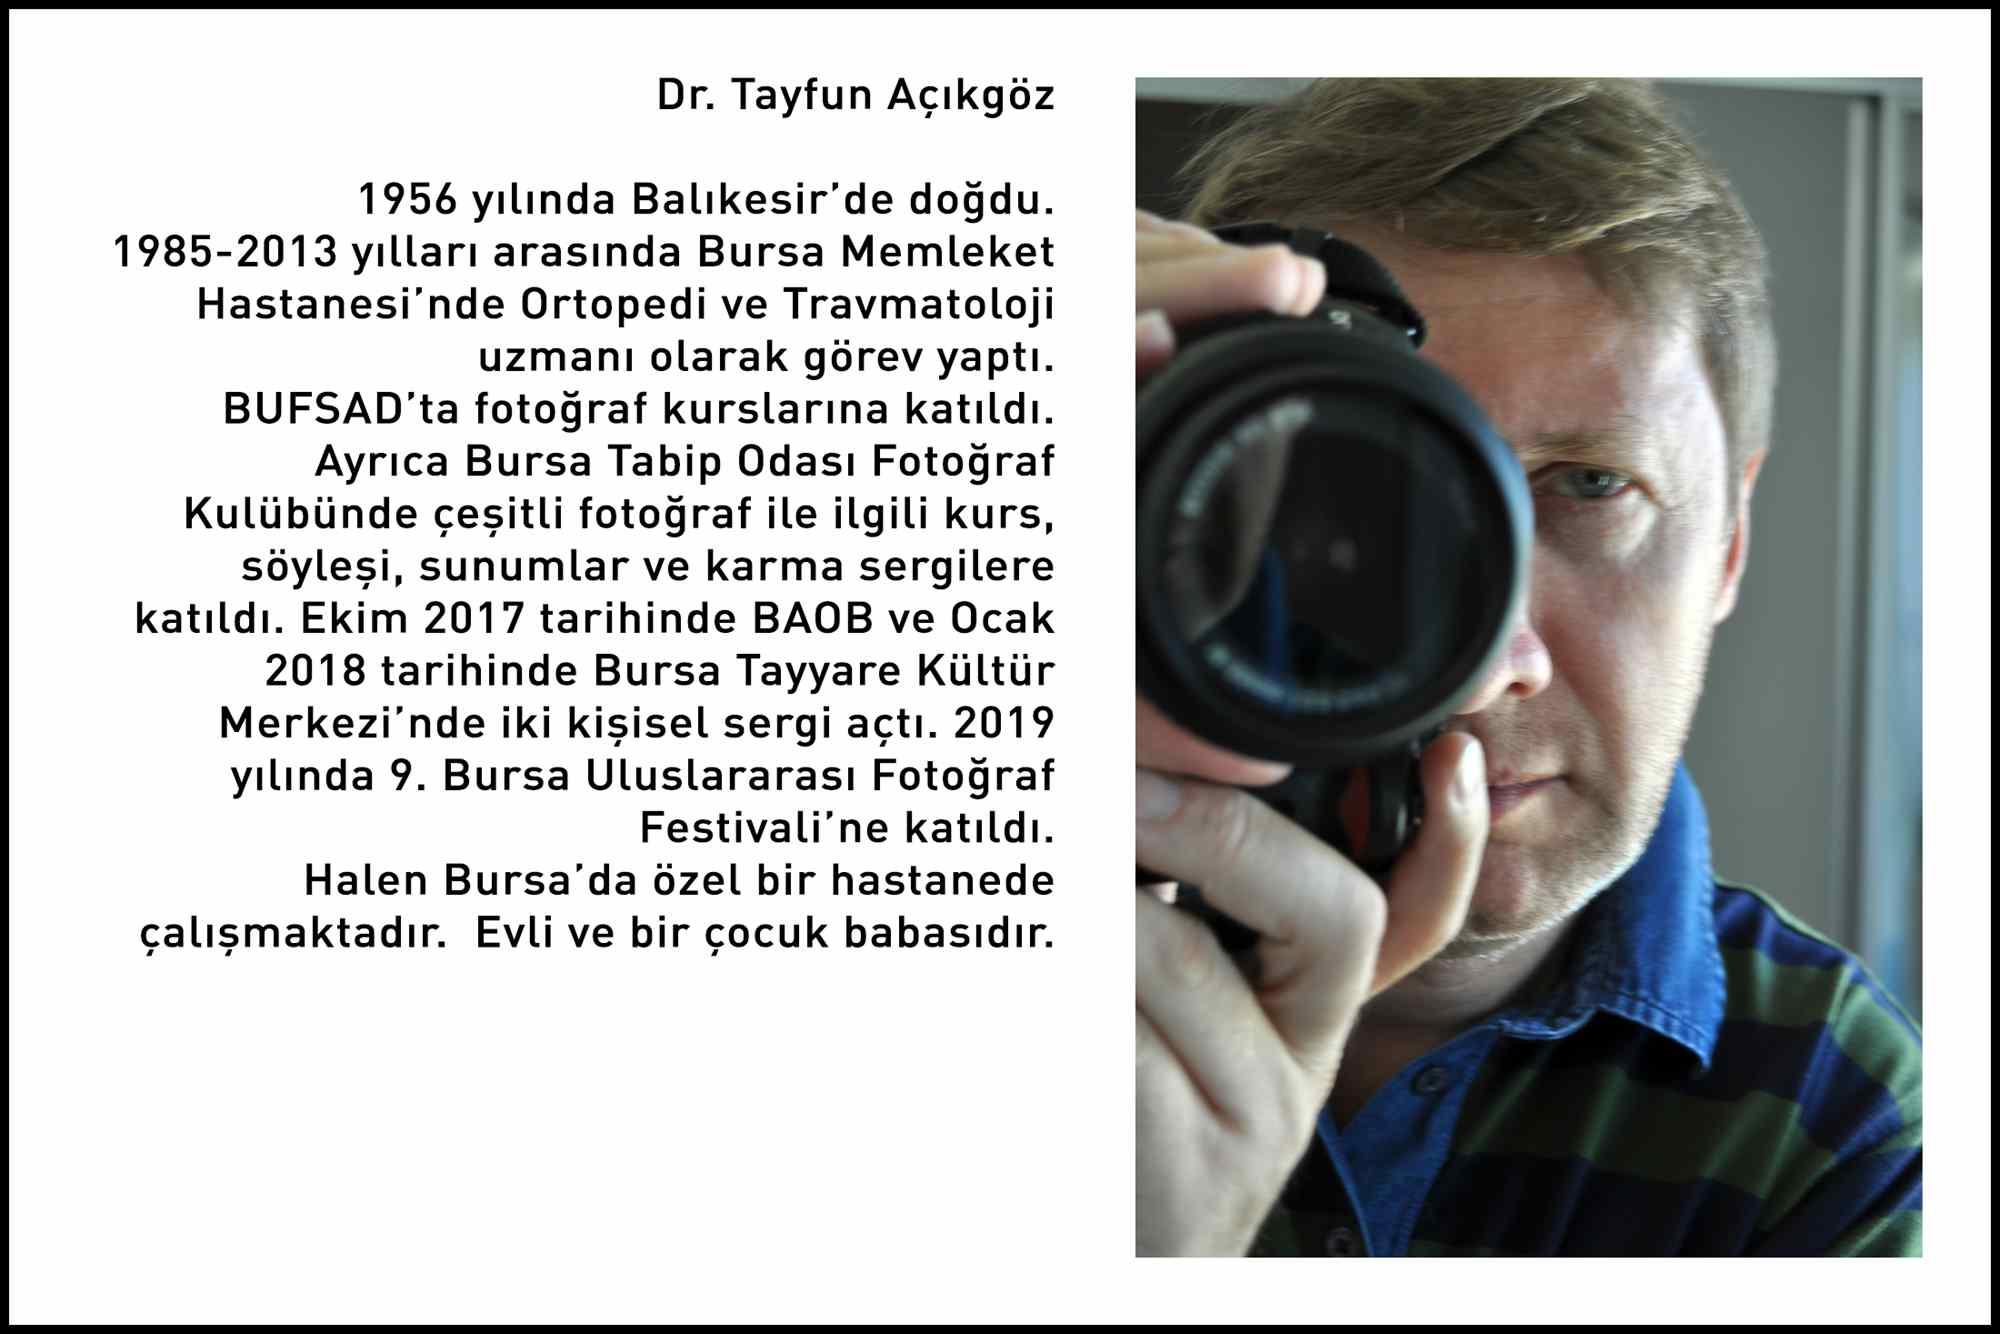 86_tayfun-acikgoz_ozgecmis